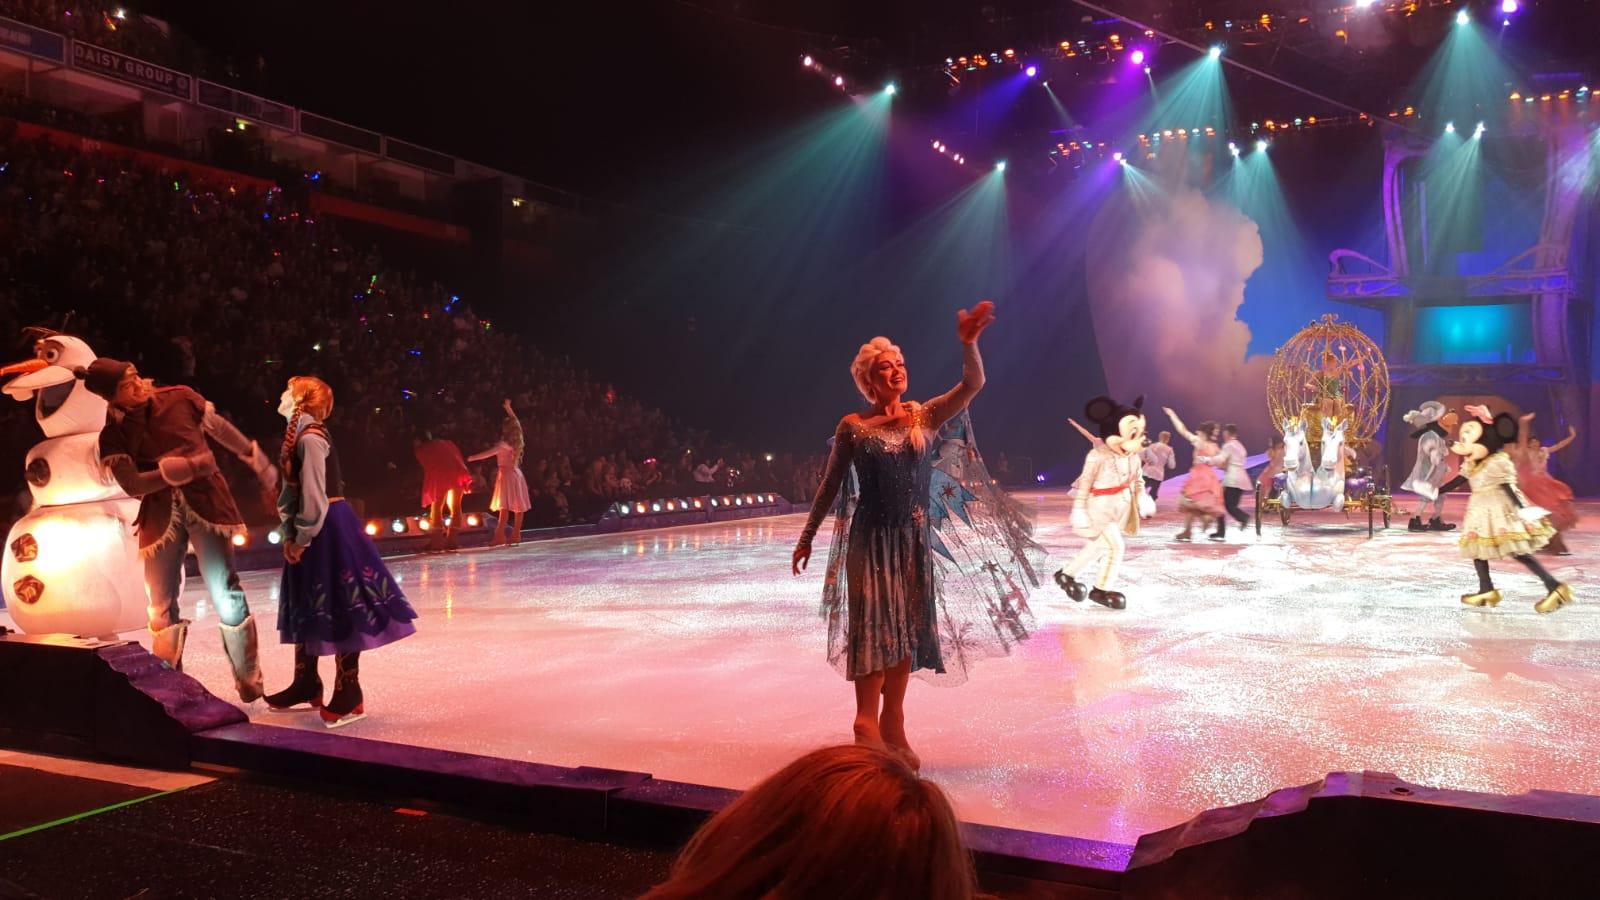 Elsa and Anna on ice